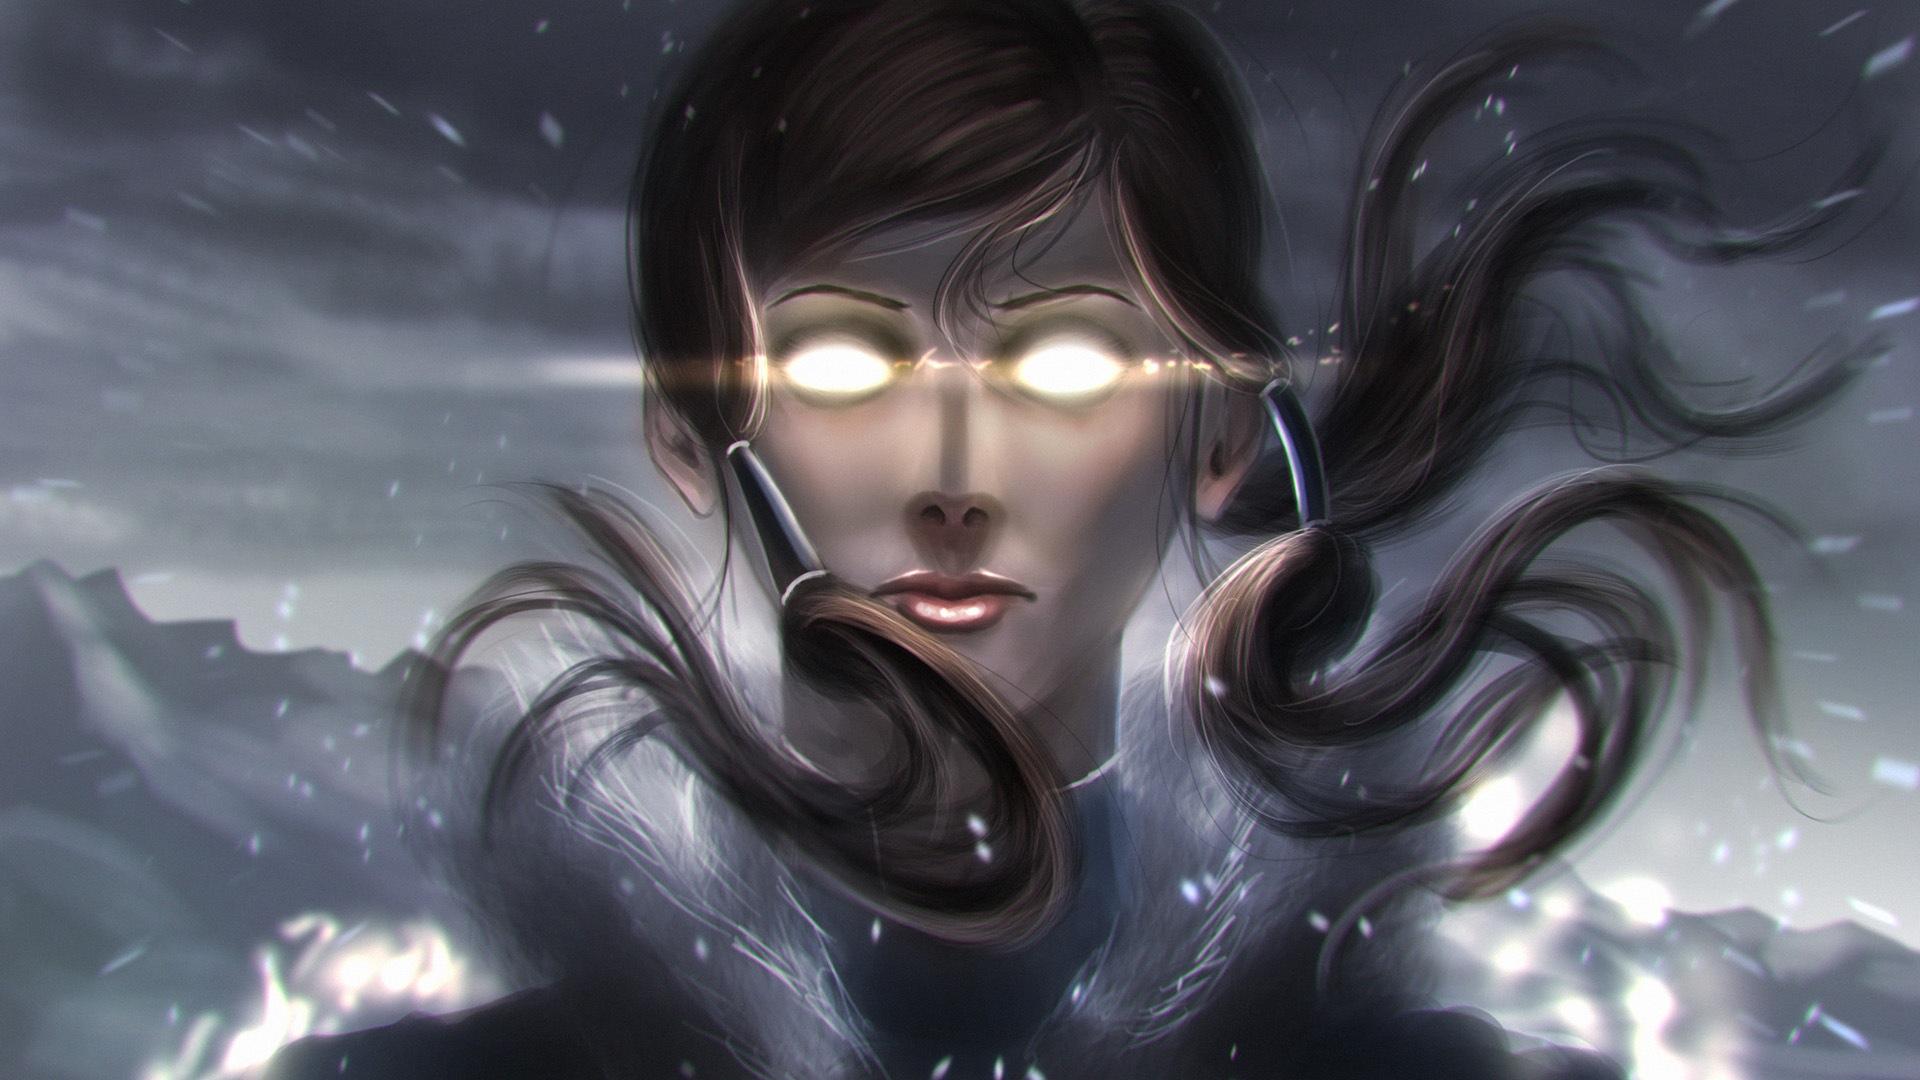 Abyss everything avatar anime avatar the legend of korra 367736